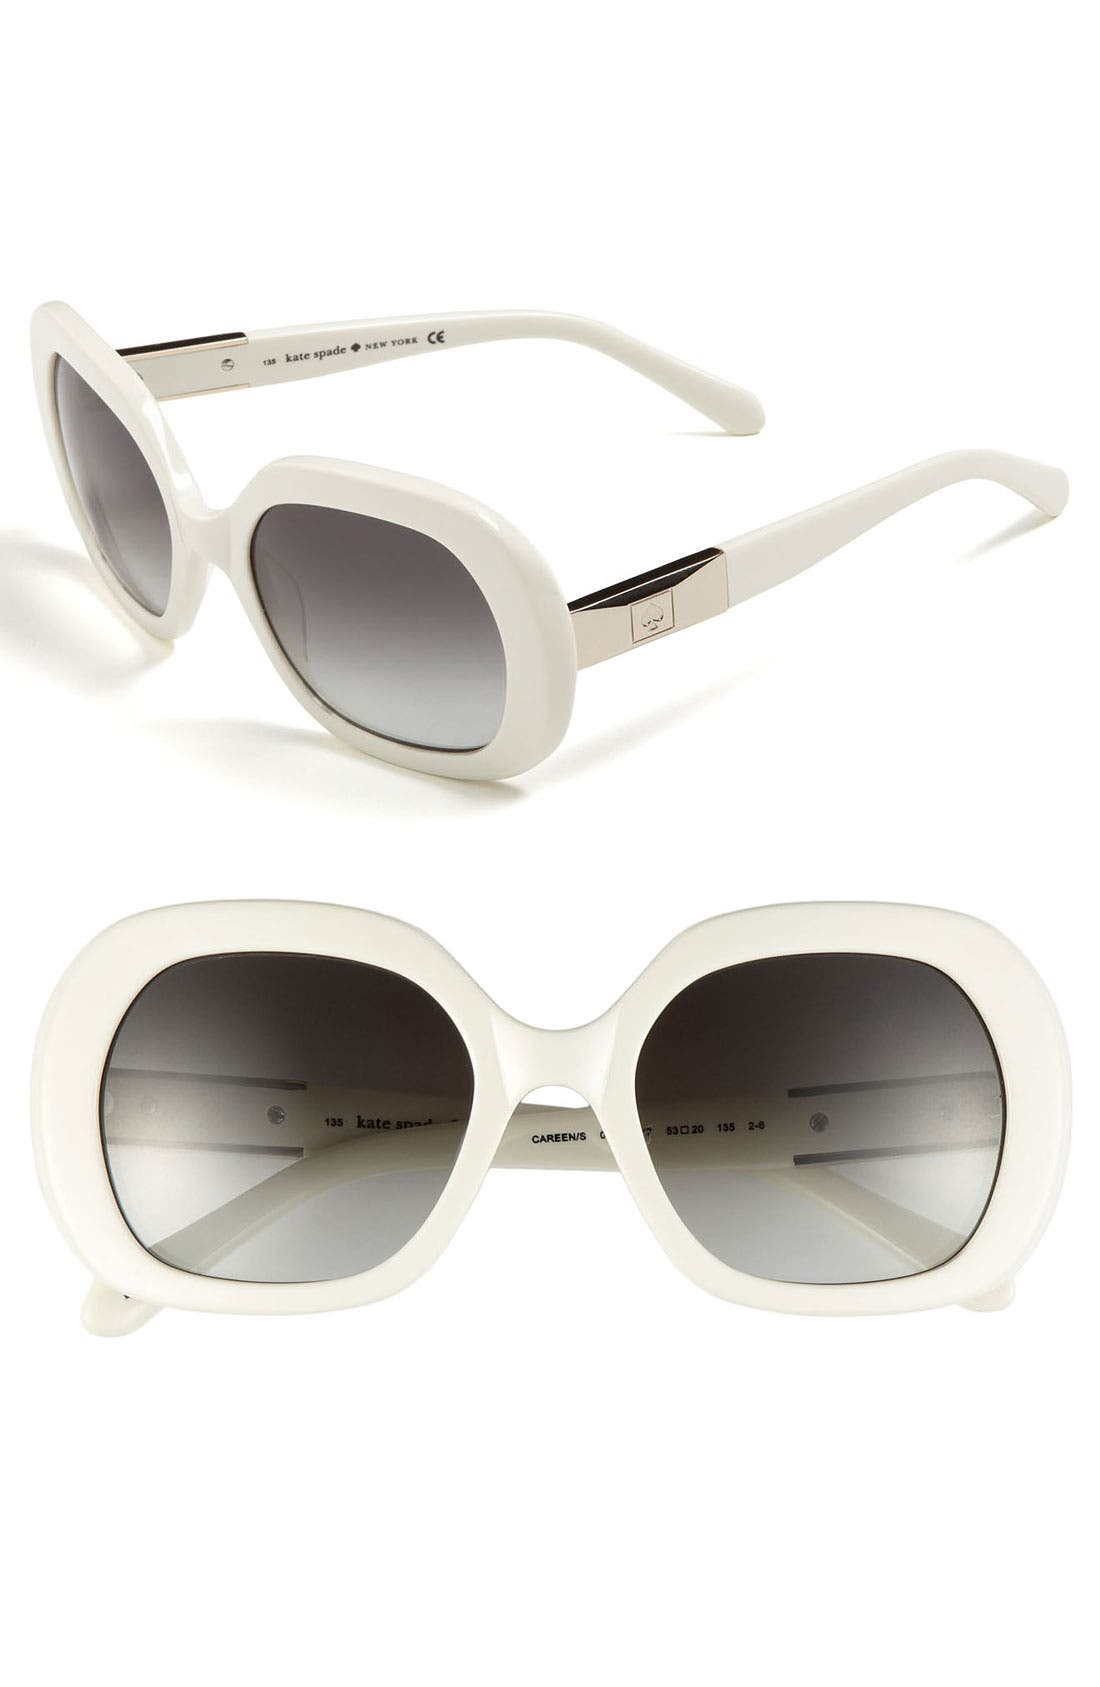 Main Image - kate spade new york 'careen' 53mm sunglasses